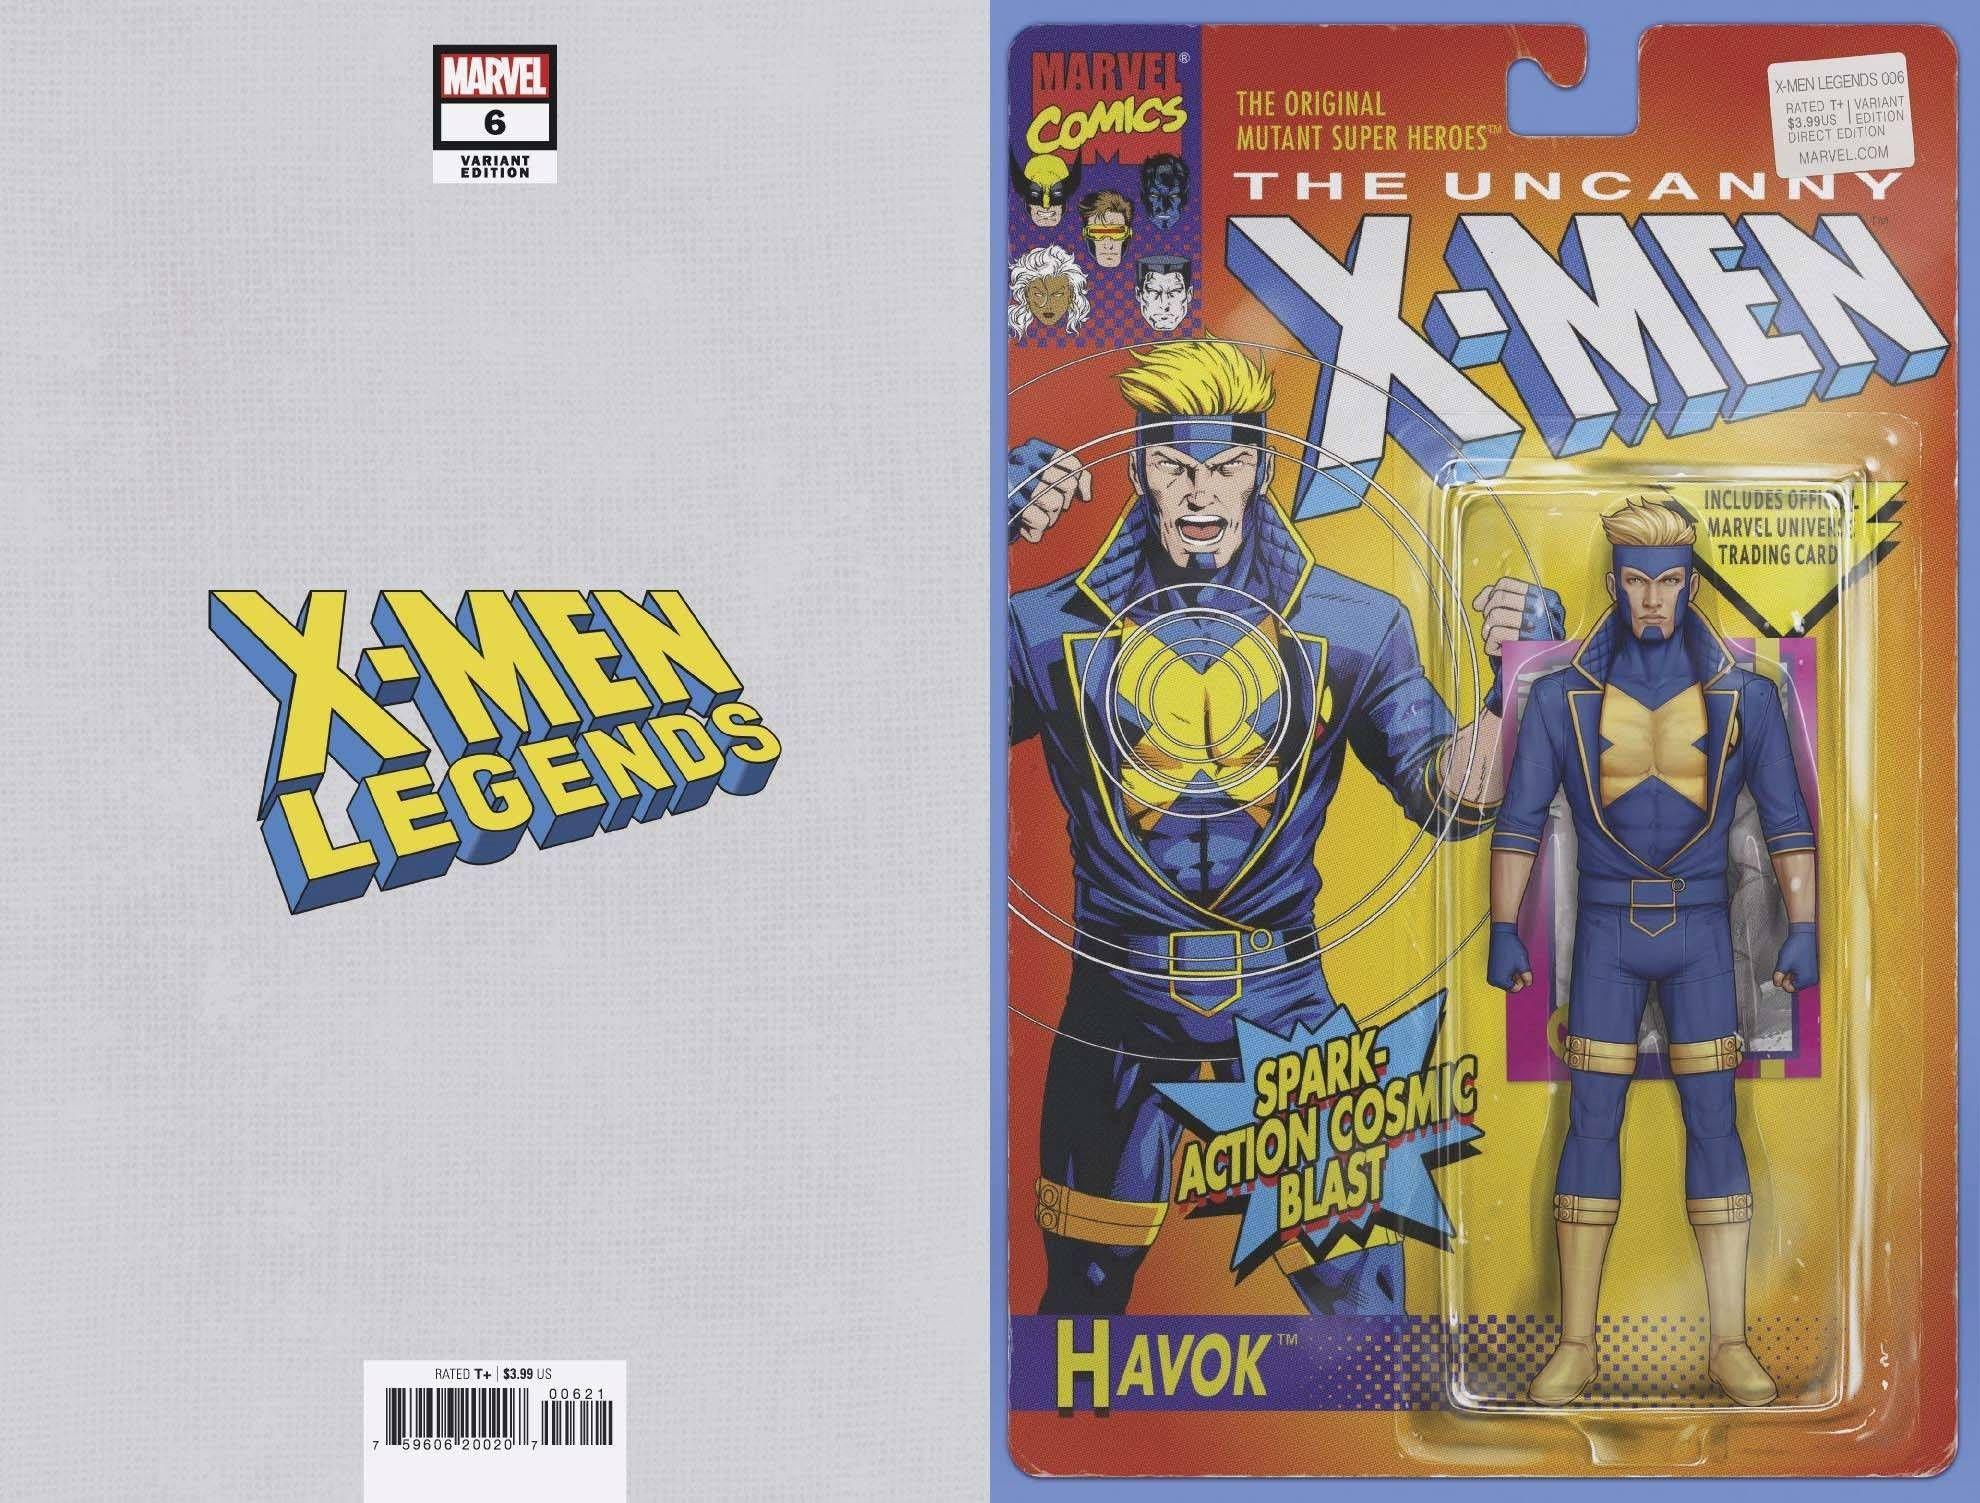 eyJidWNrZXQiOiJnb2NvbGxlY3QuaW1hZ2VzLnB1YiIsImtleSI6IjYwMWYxMjE0LWQwODEtNDc5YS1hMjgzLWQyOTA3MGFlN2Q4ZS5qcGciLCJlZGl0cyI6W119 ComicList: Marvel Comics New Releases for 08/11/2021